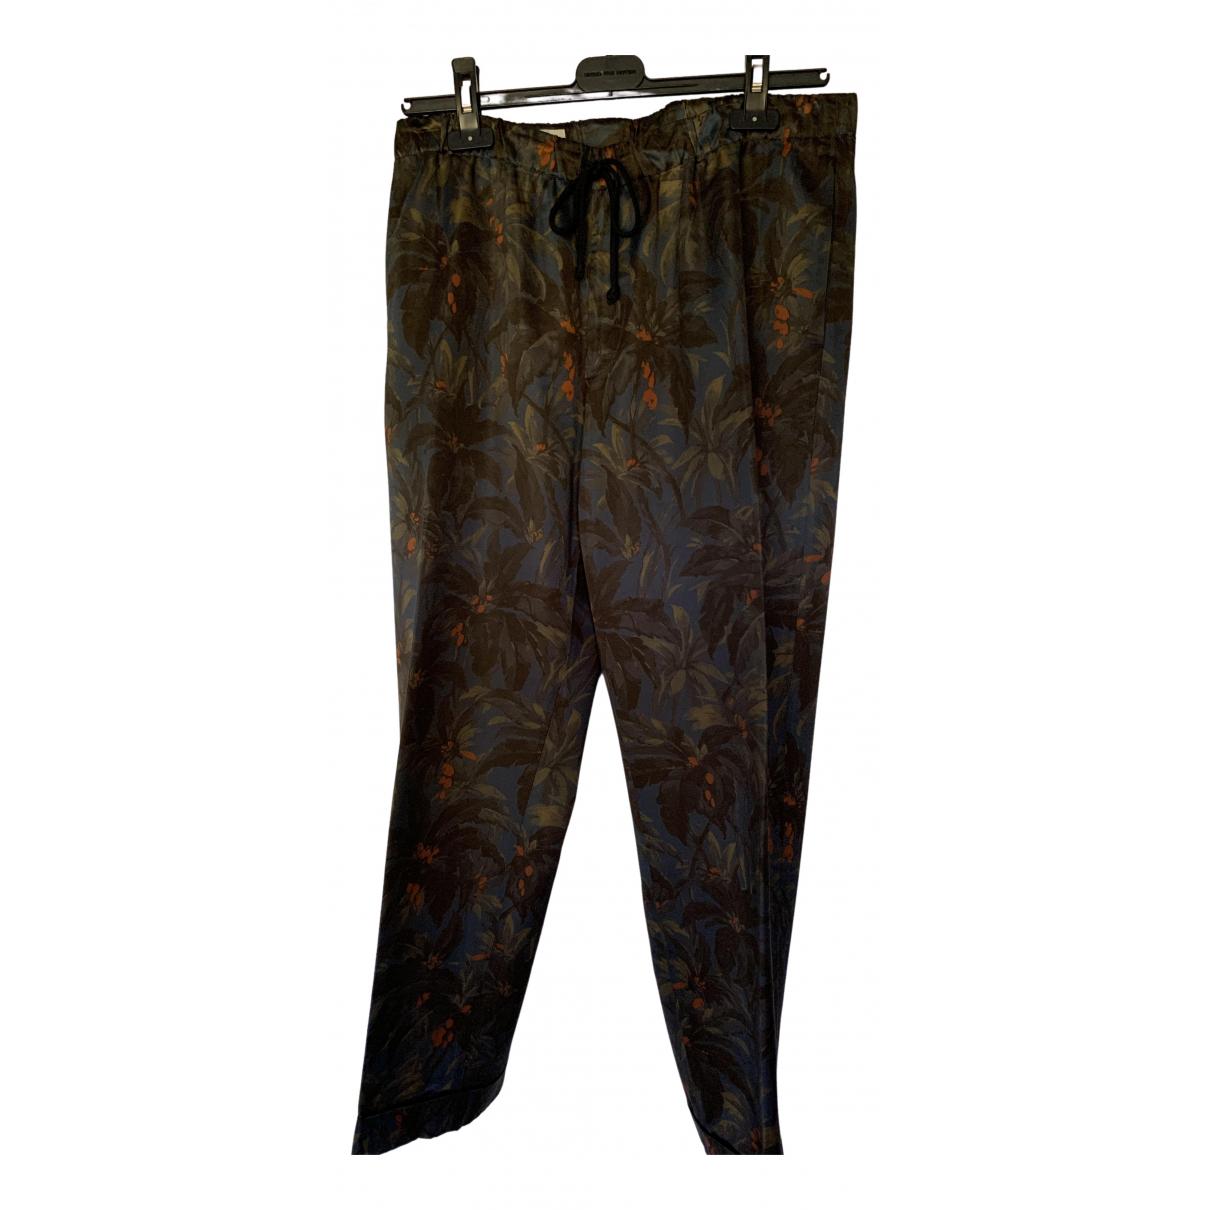 Dries Van Noten \N Multicolour Trousers for Men 50 IT